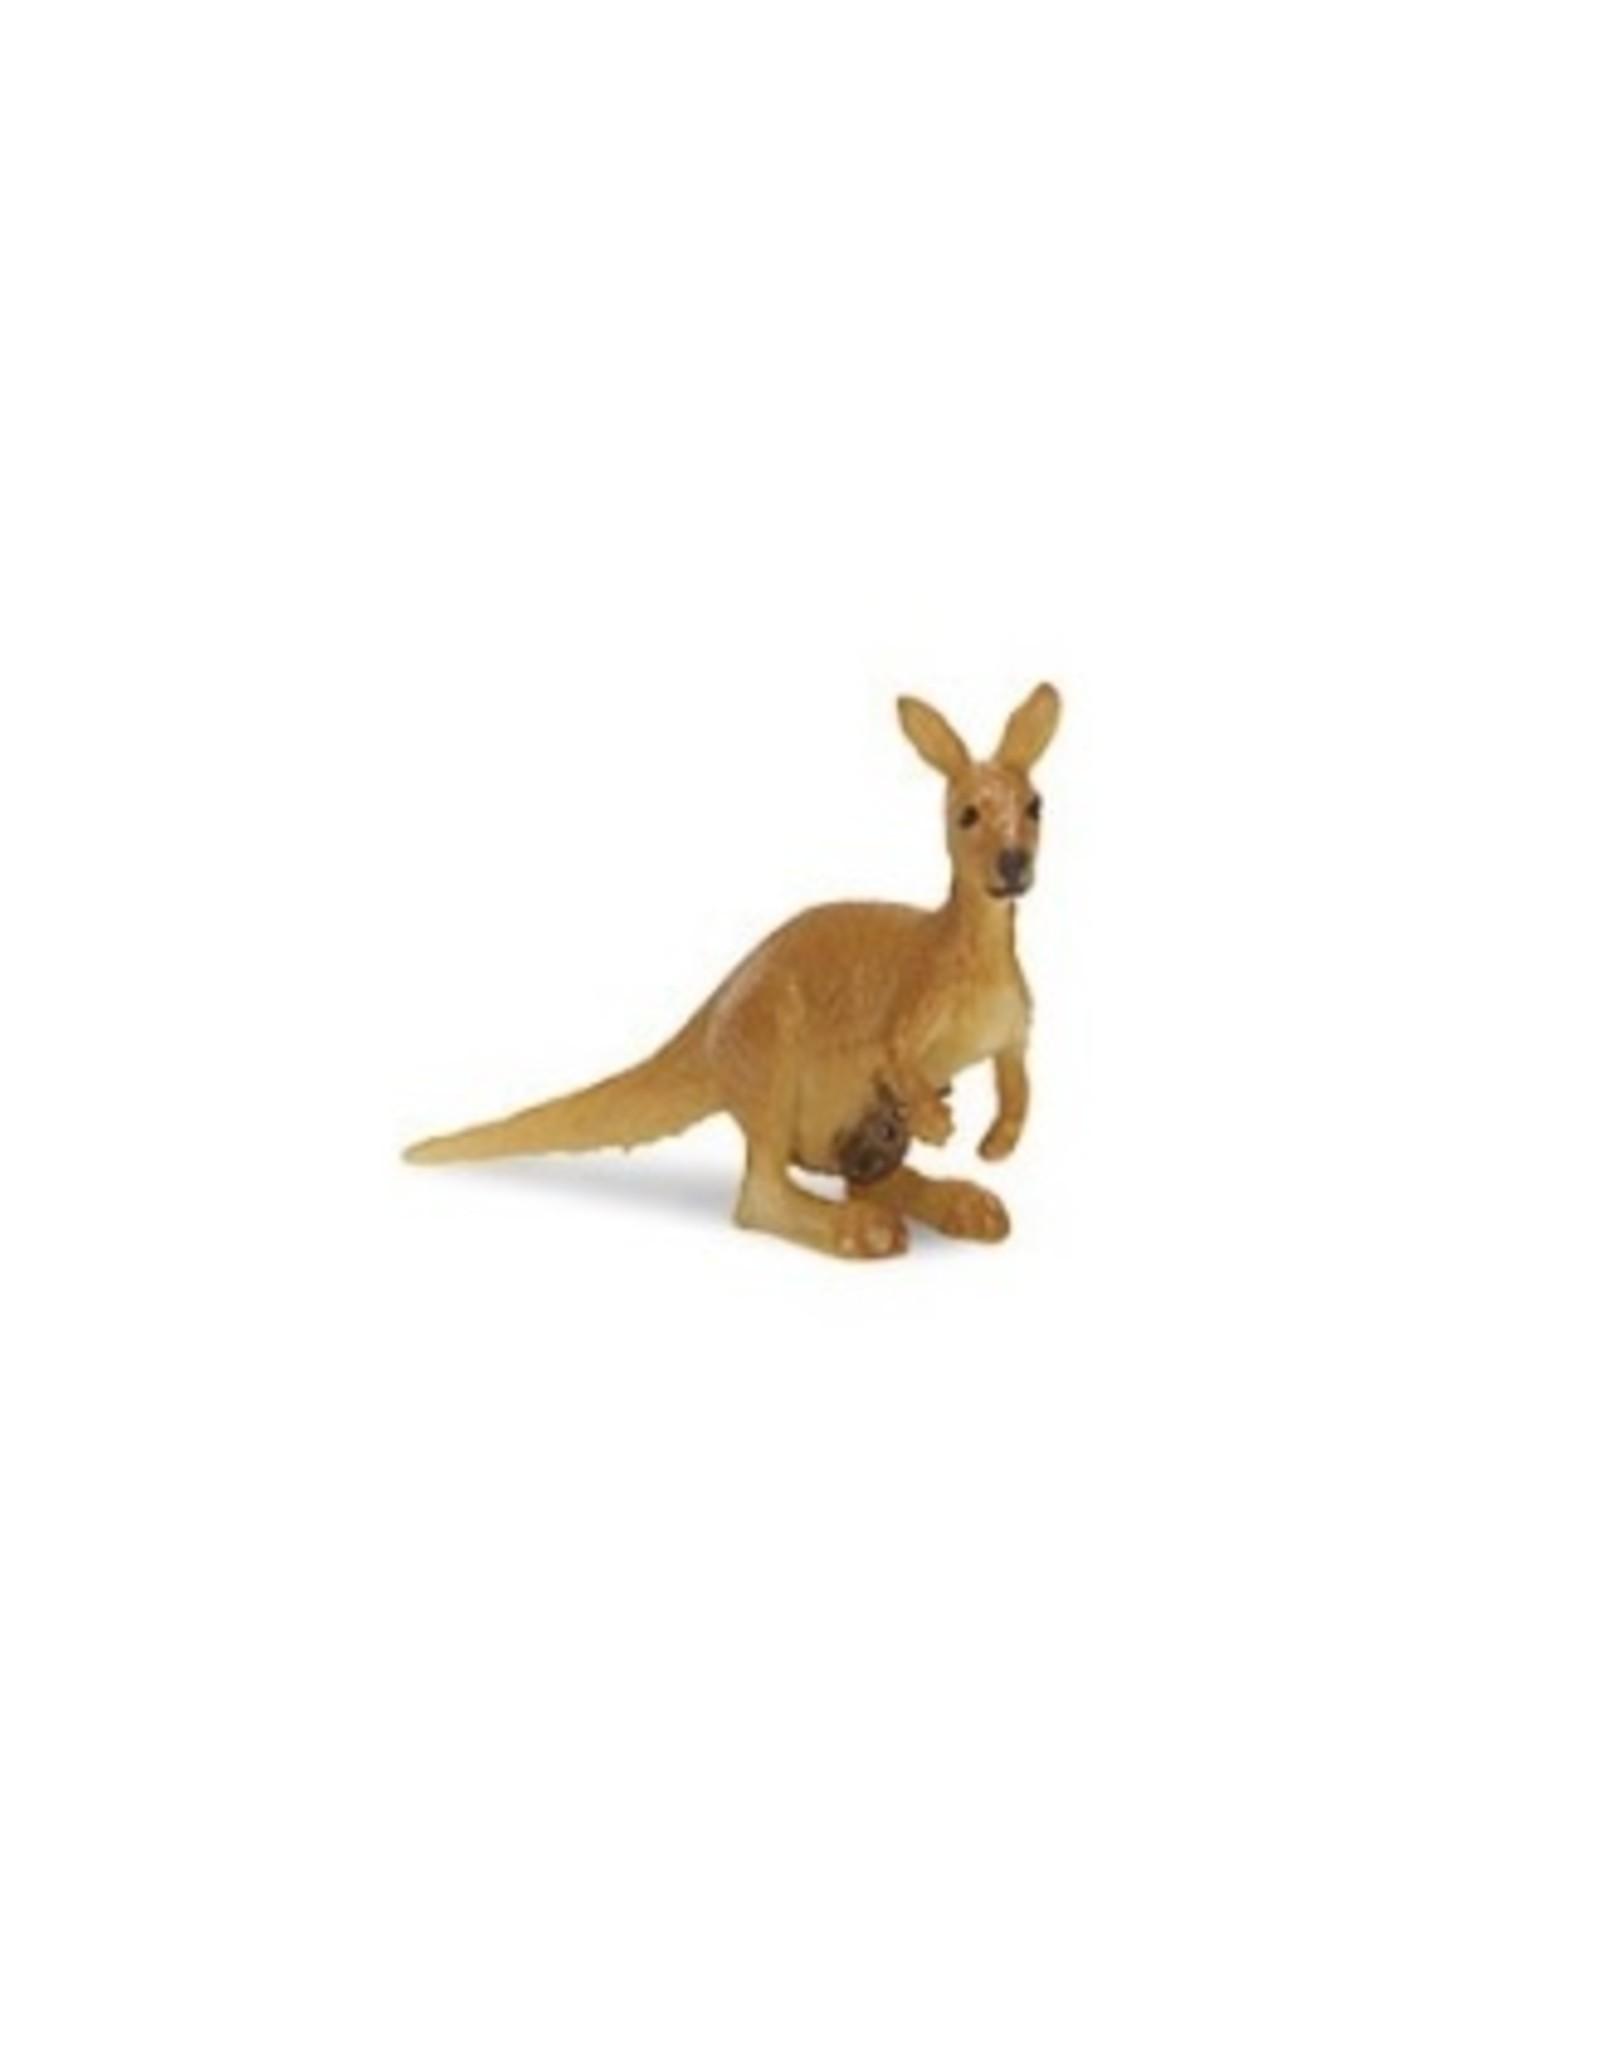 Goodluck mini - kangaroo